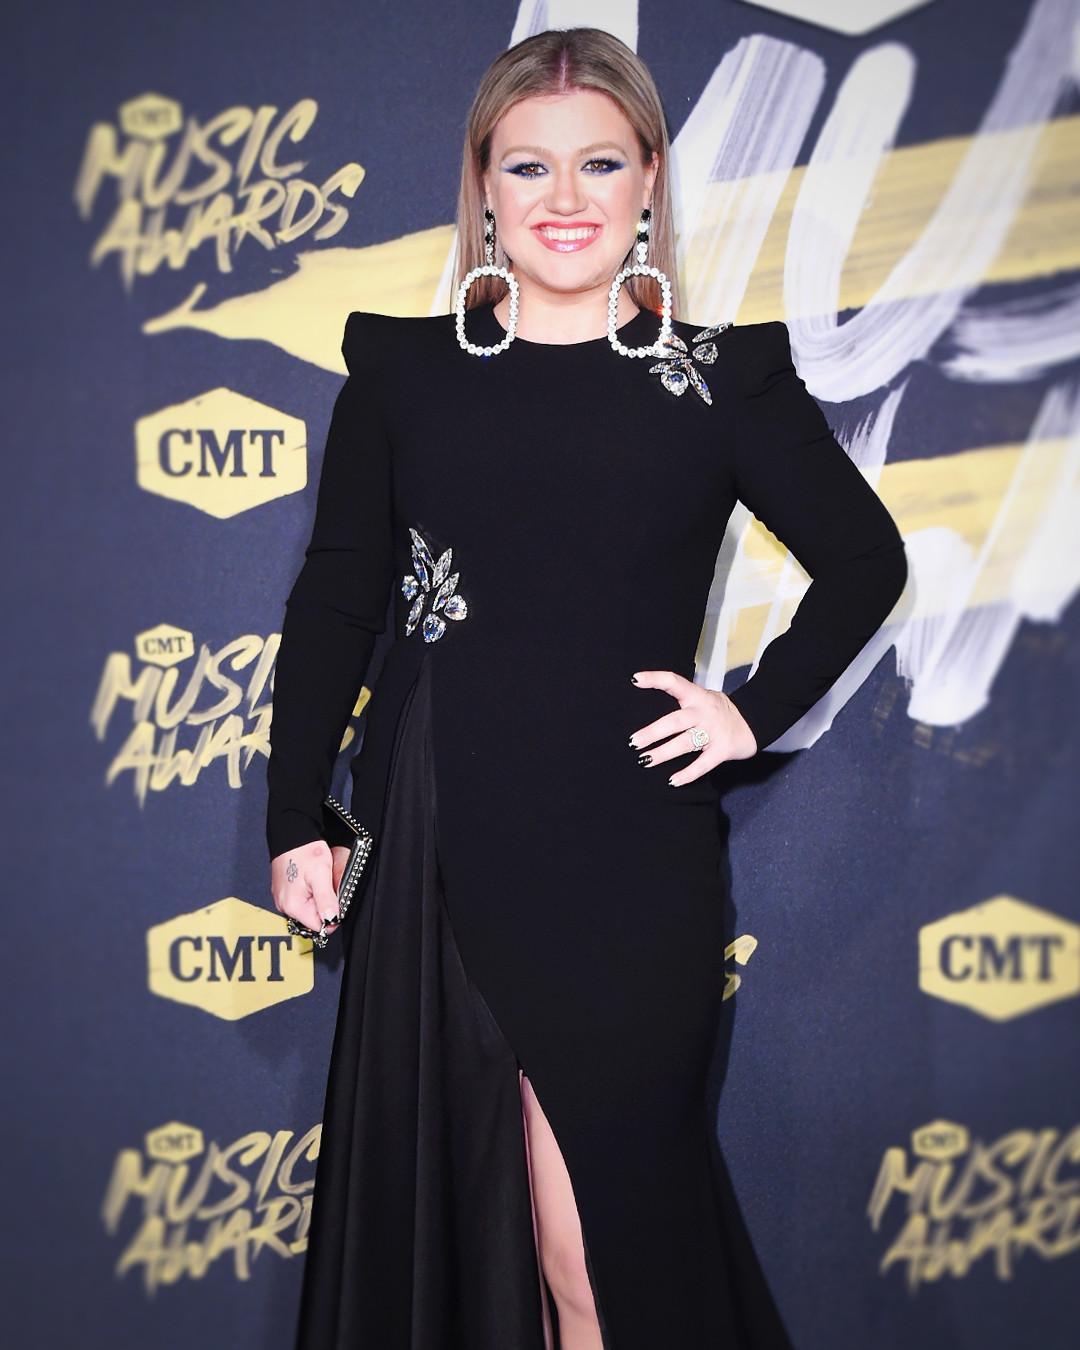 ESC: Kelly Clarkson, CMT Music Awards 2018